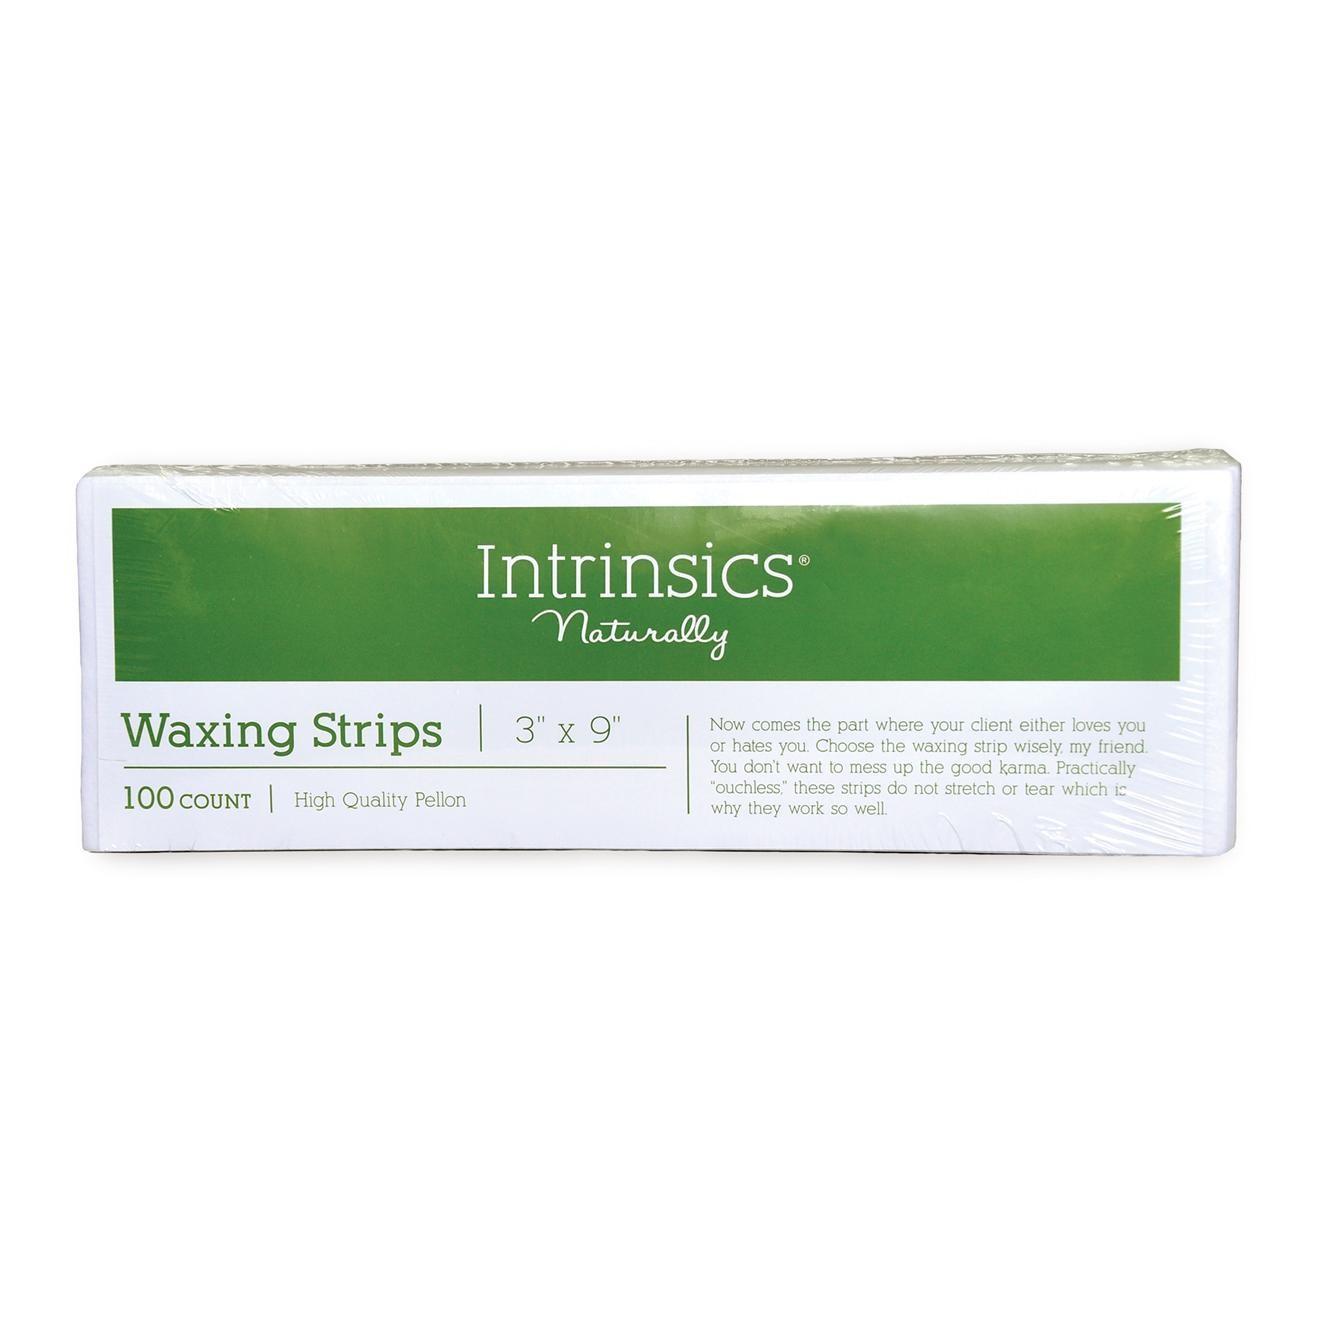 Intrinsics Waxing Strips